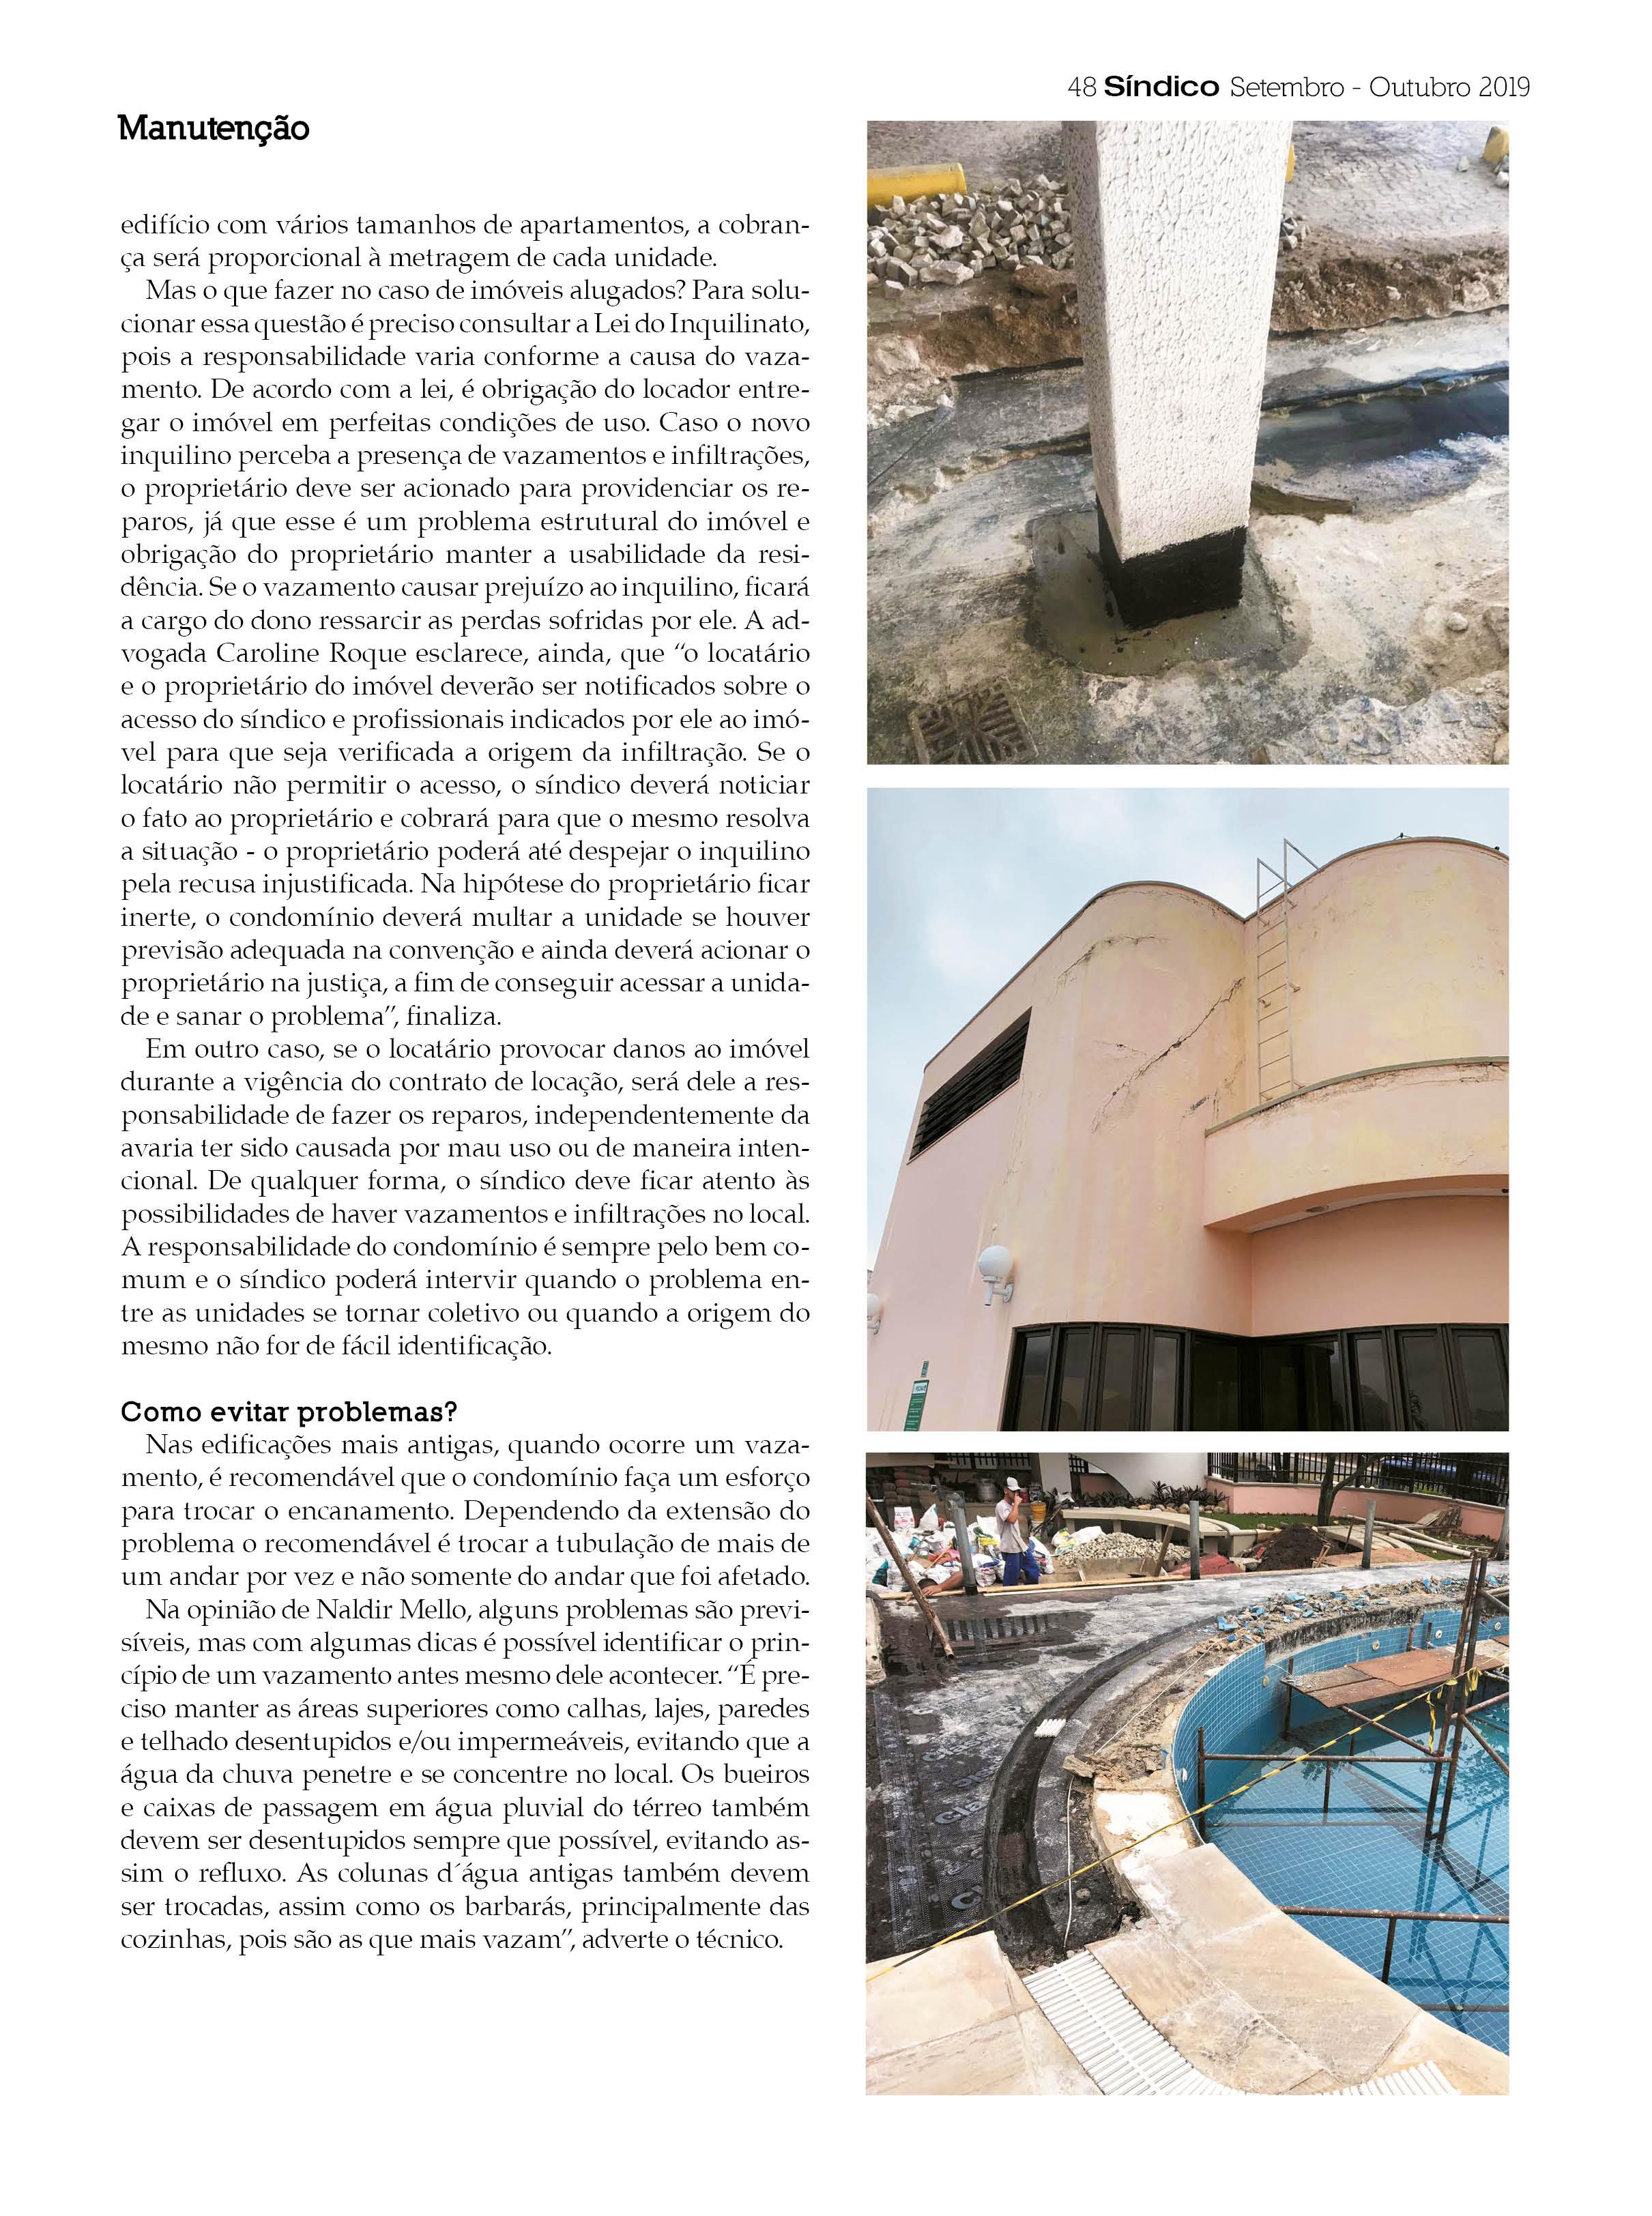 Revista Síndico_ed 246_46